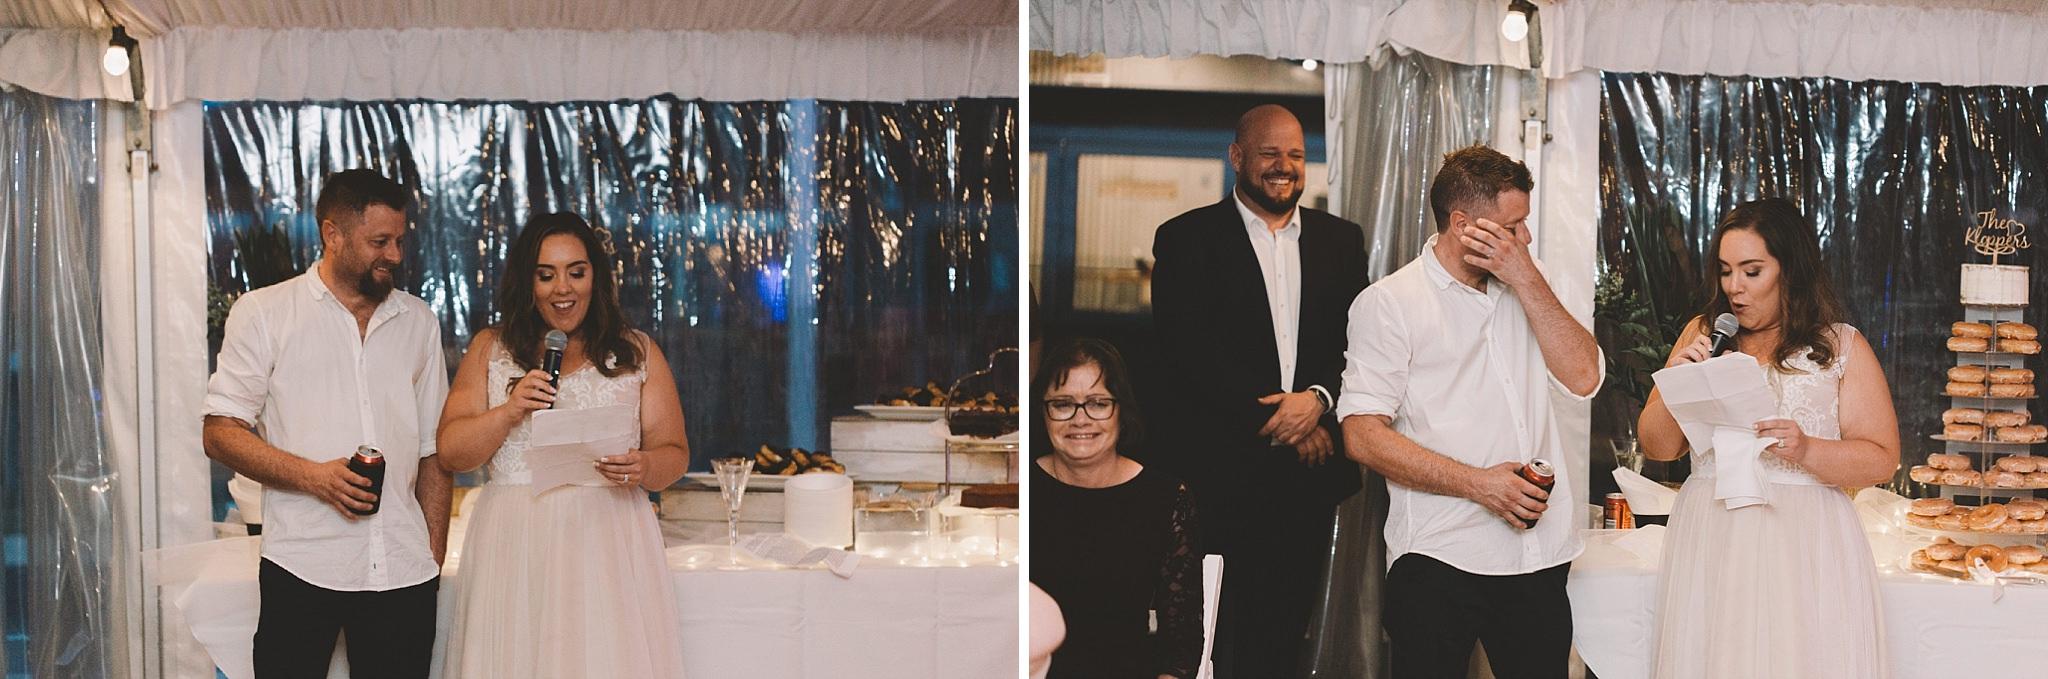 Mornington Peninsula Wedding Photographer 152.JPG